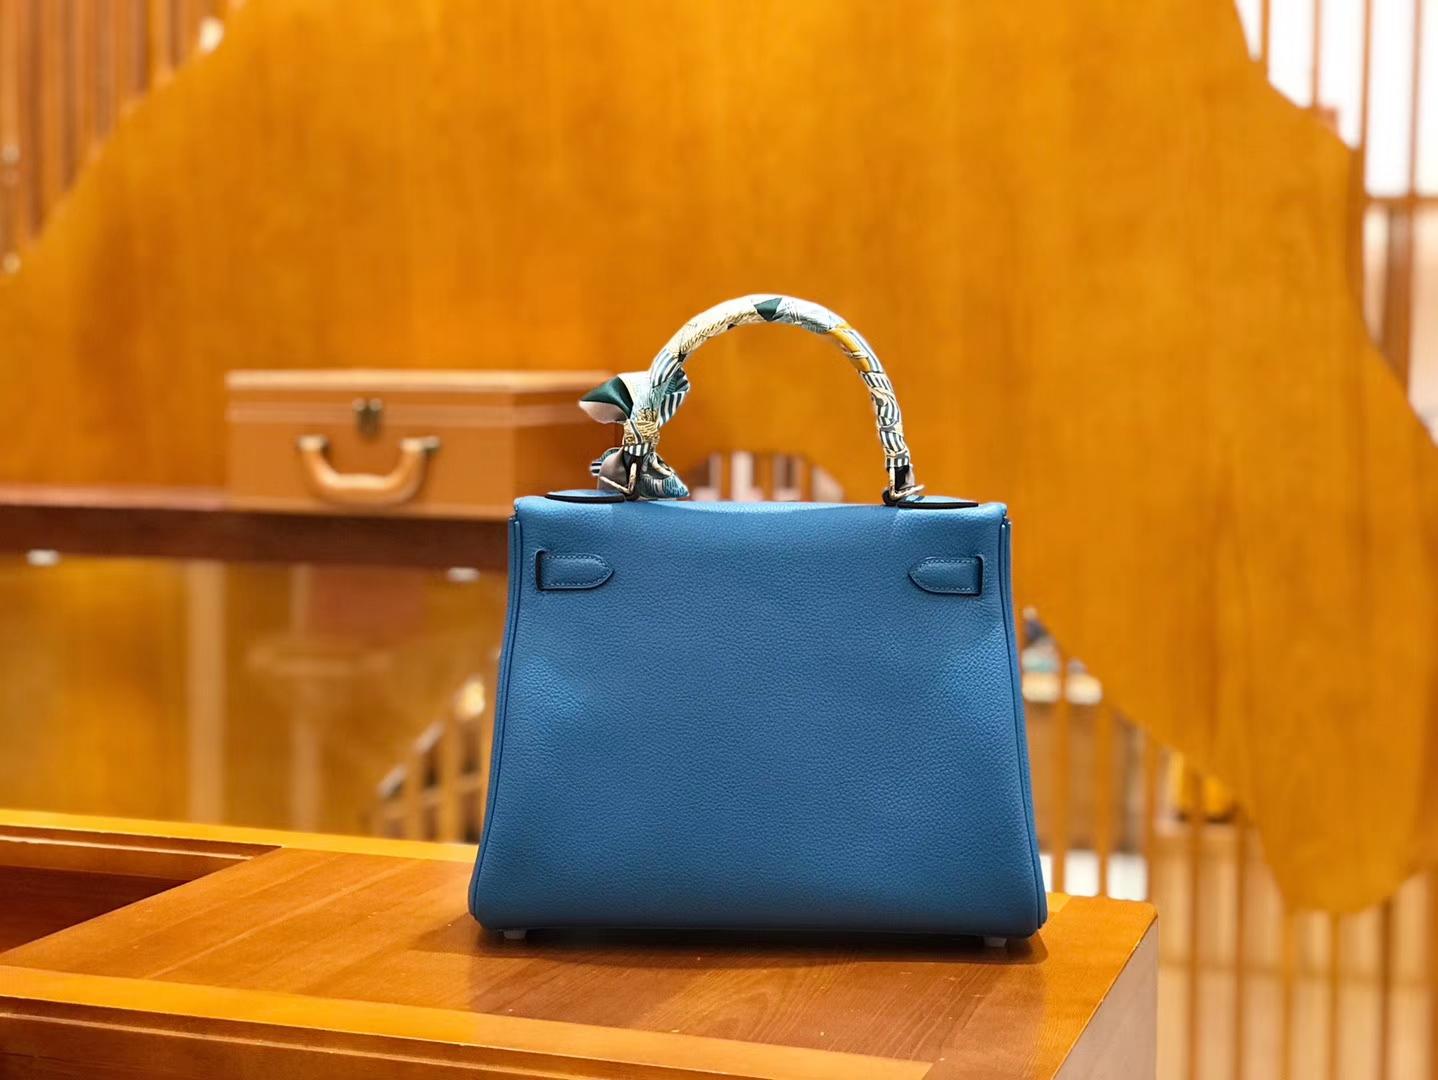 Hermès(爱马仕)Kelly 28cm togo 牛皮 坦桑尼亚蓝 银扣 全手工缝制 现货